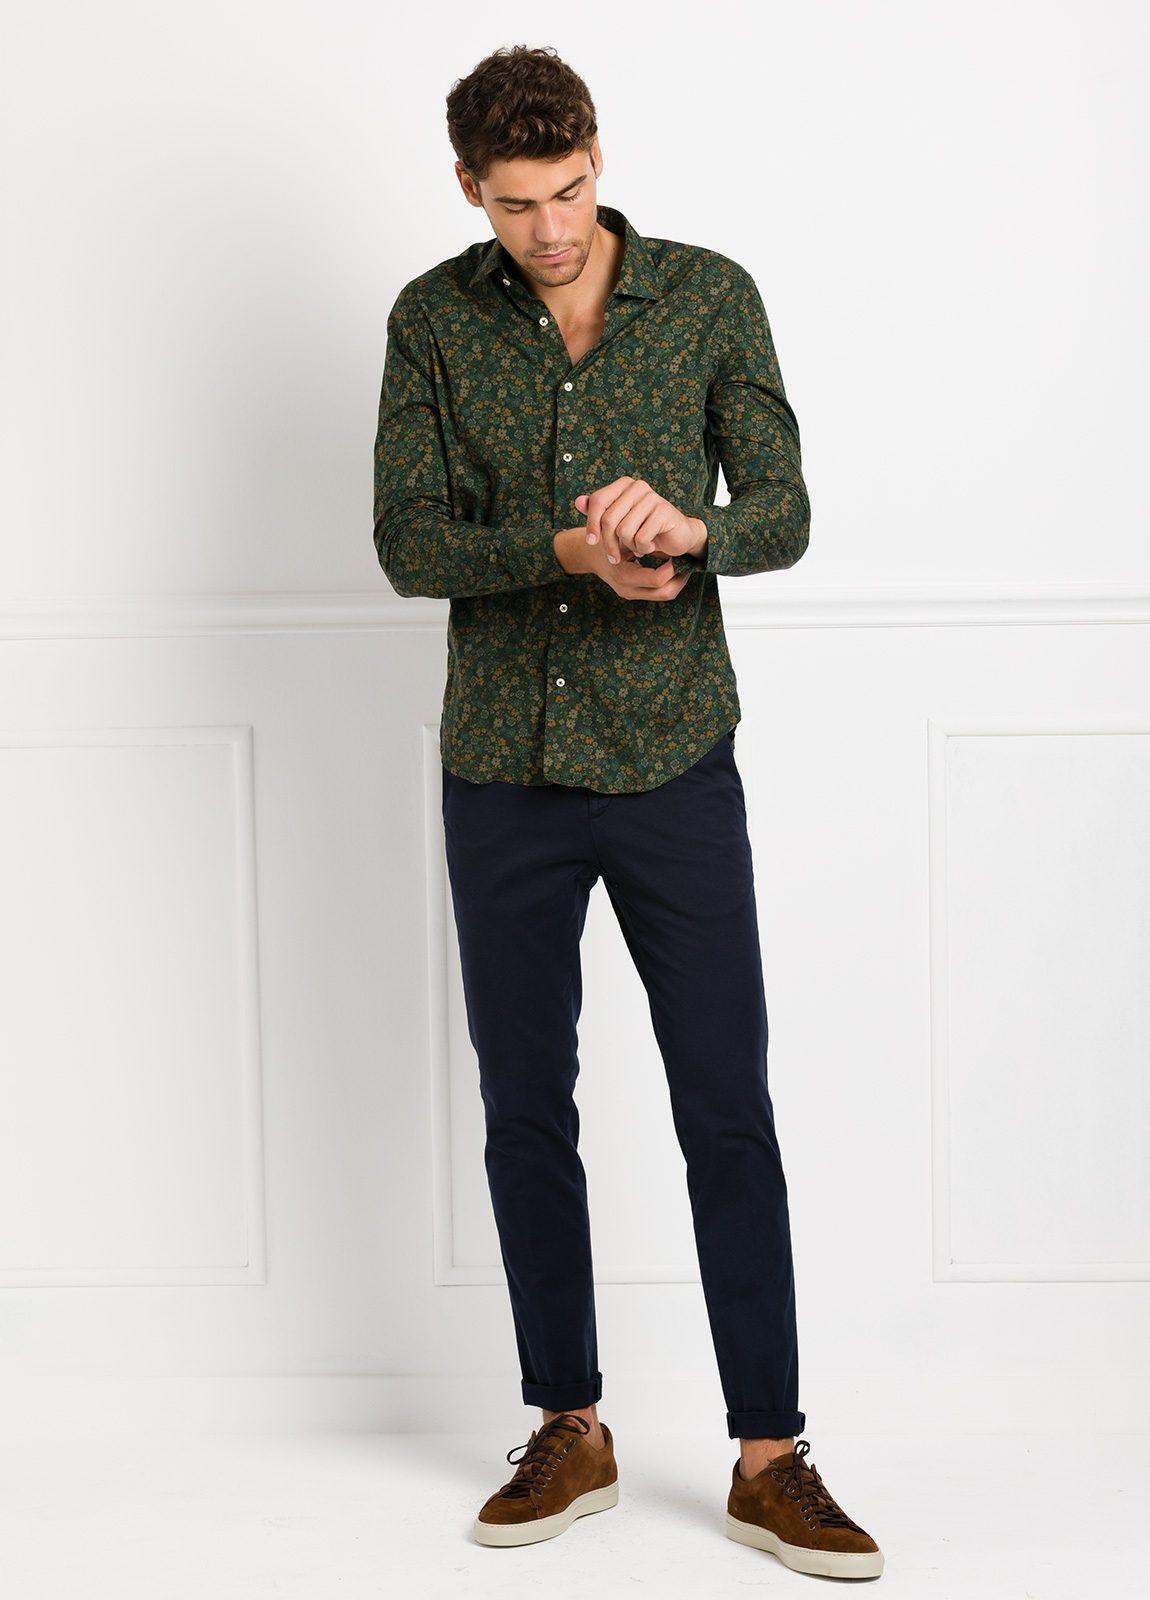 Camisa Leisure Wear SLIM FIT modelo PORTO estampado flores color verde. 100% Algodón. - Ítem1